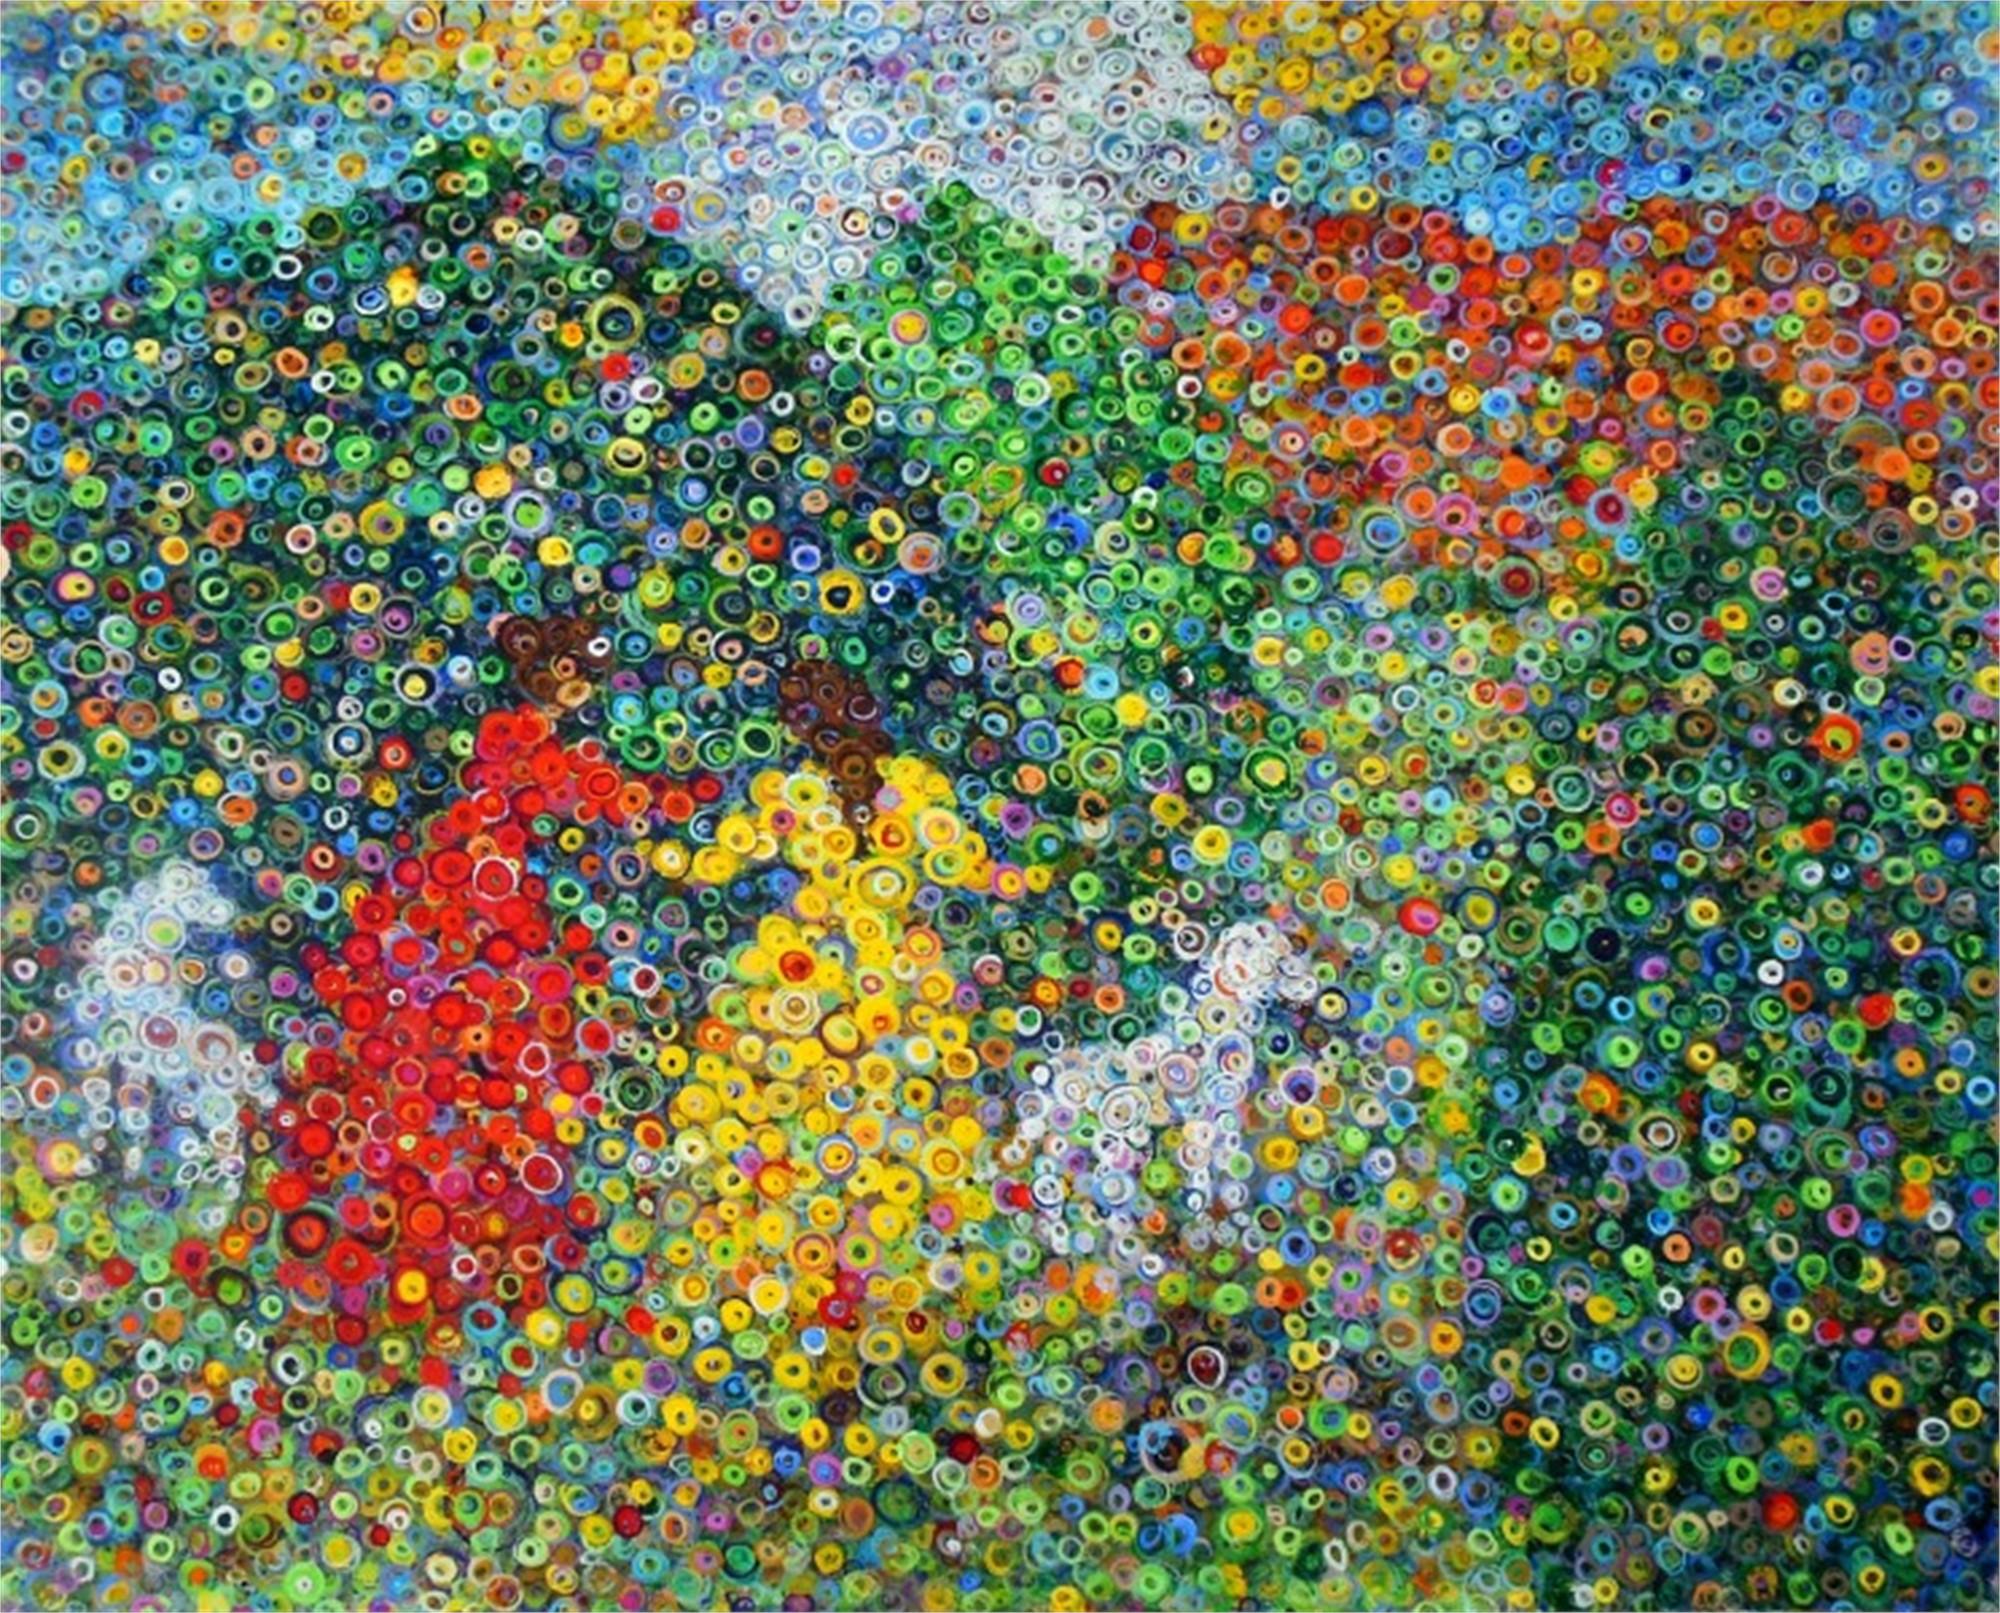 Garden of the Gods by Marcio Diaz